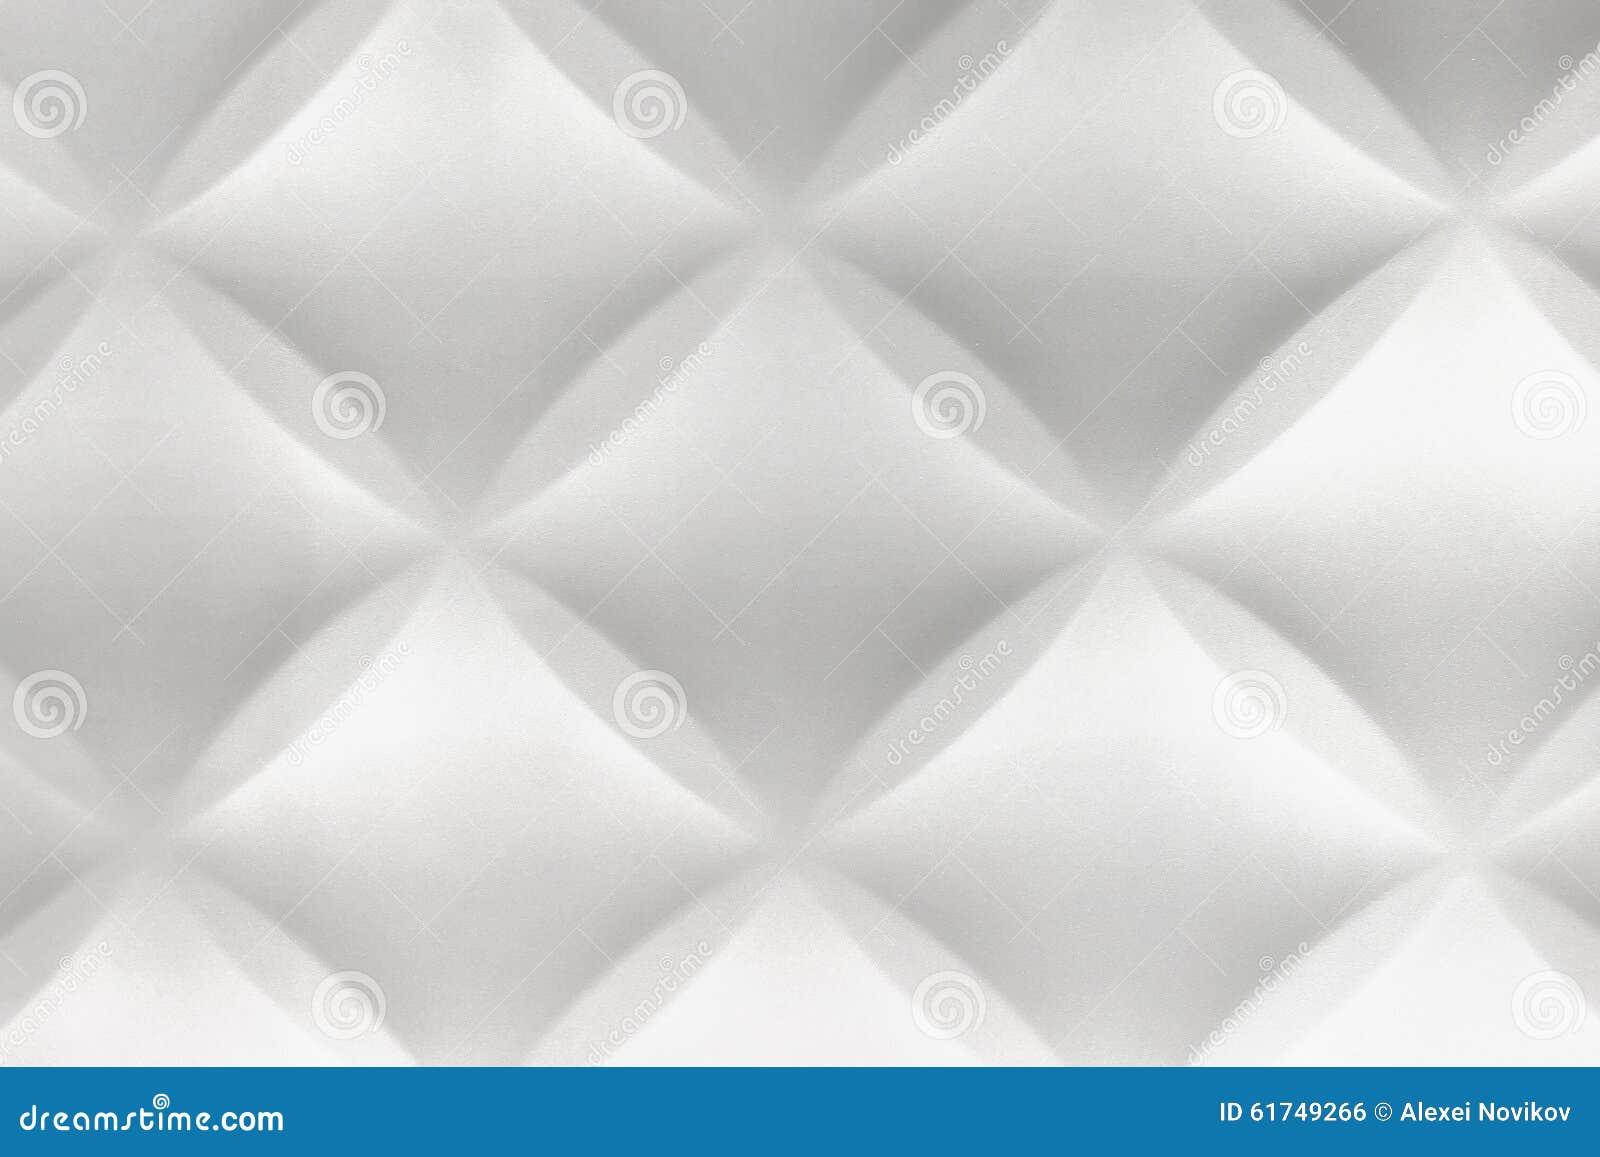 Interieur maison moderne blanc maison moderne for Interieur maison moderne blanc